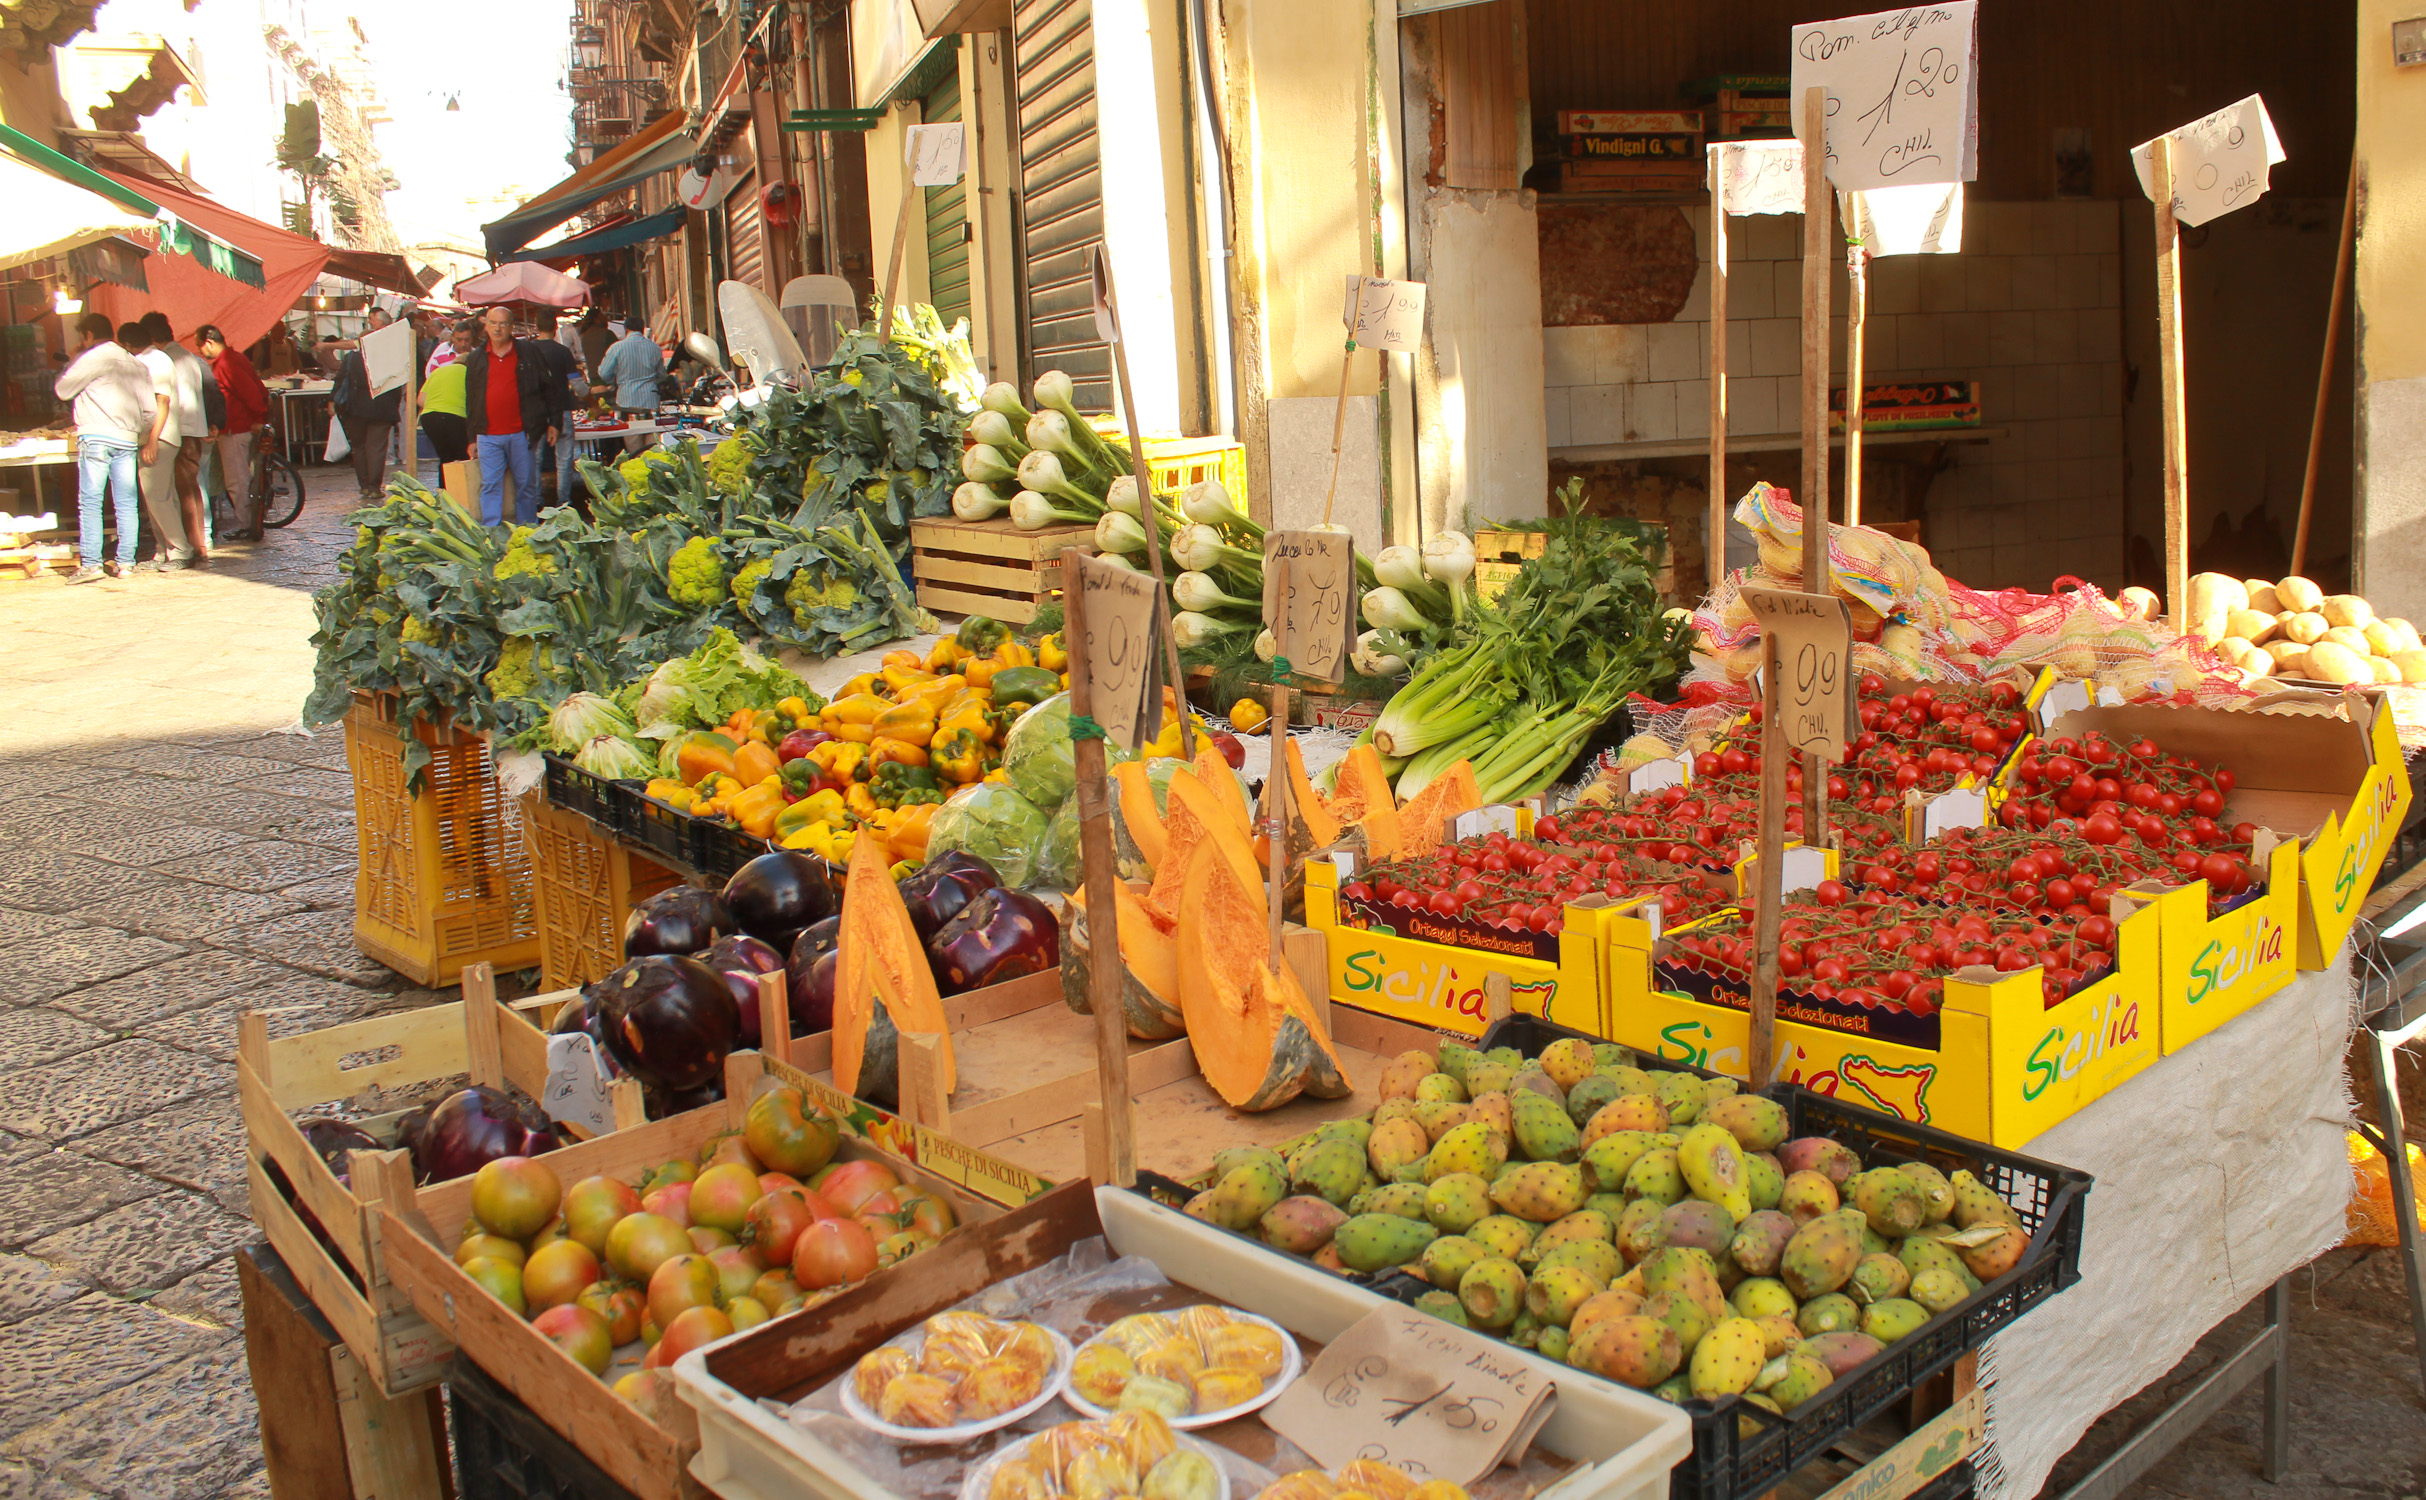 Vegetables Palermo markets